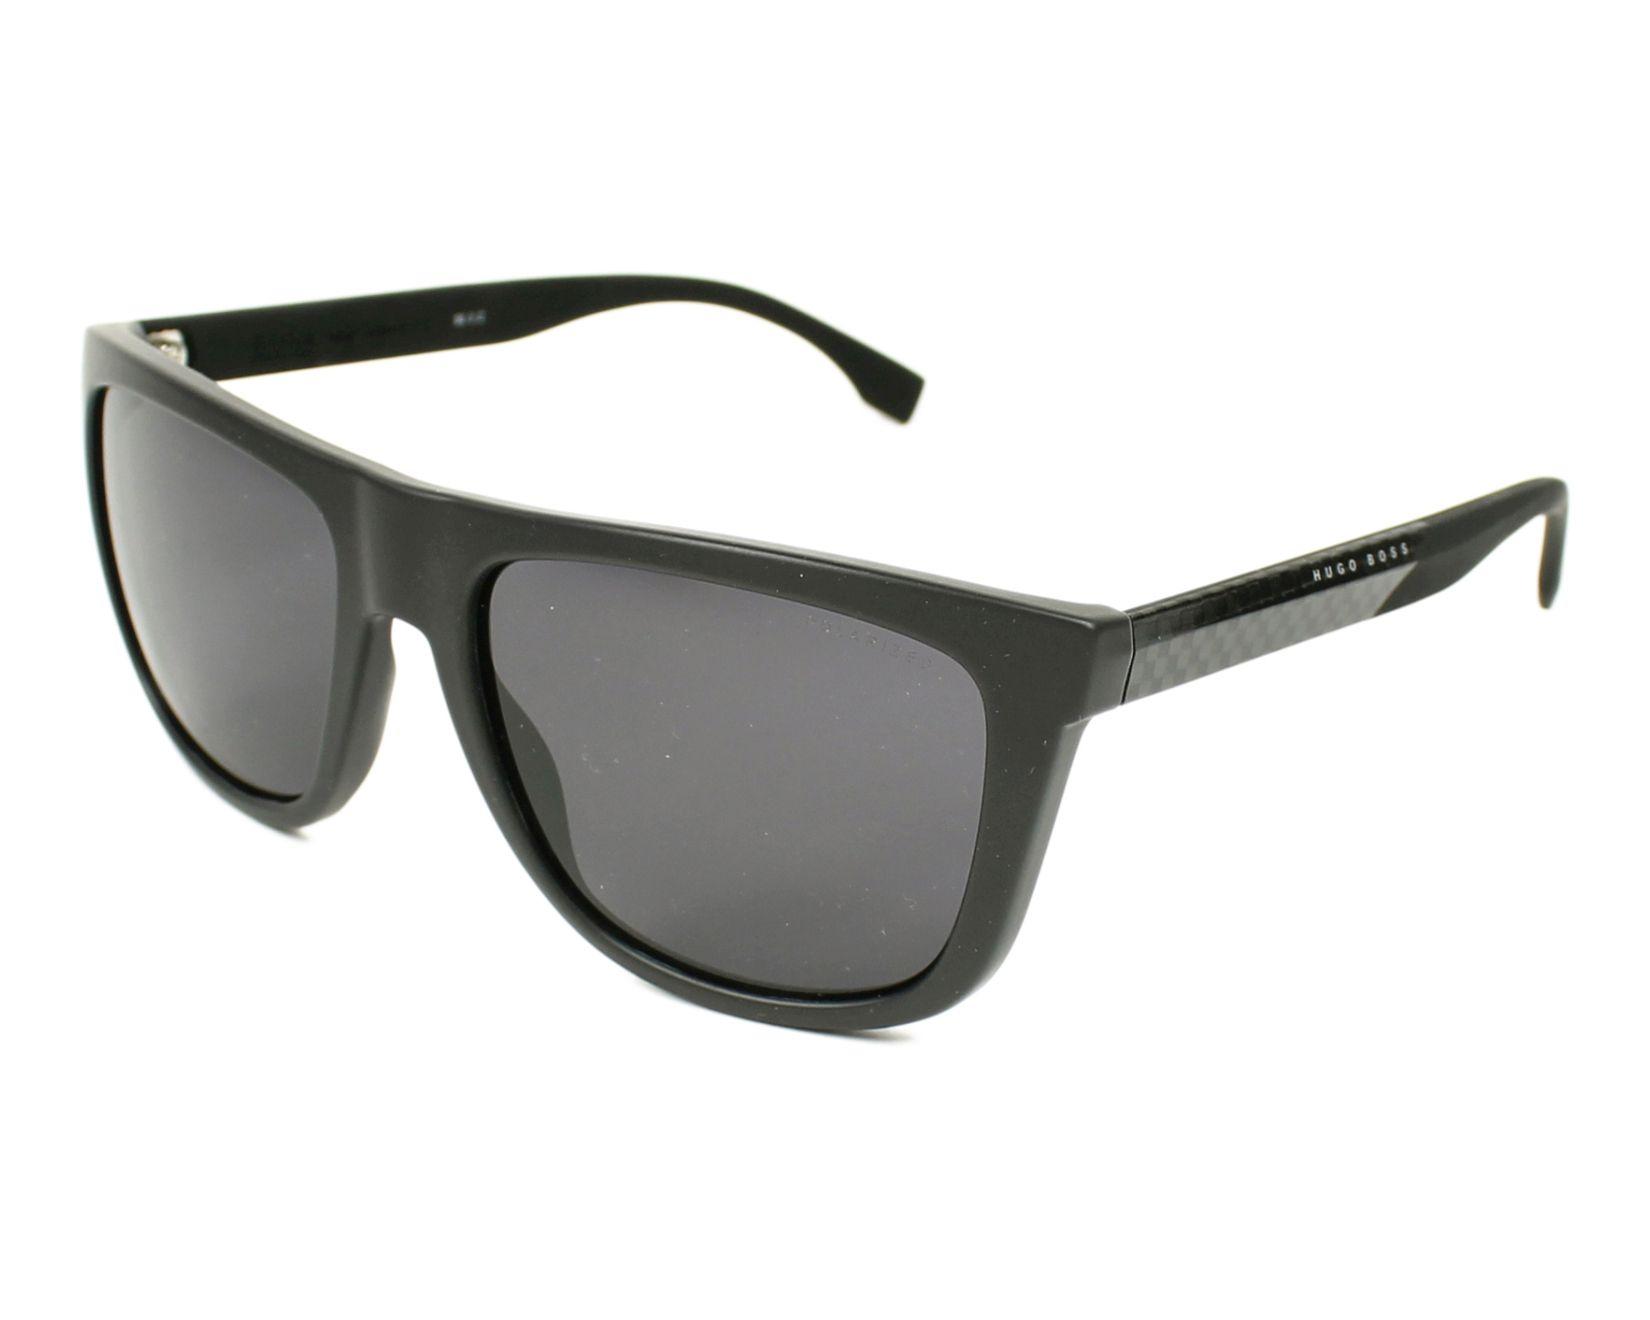 22b8f743e3532 Gafas de sol Hugo Boss BOSS-0834-S HWO 3H 56-18